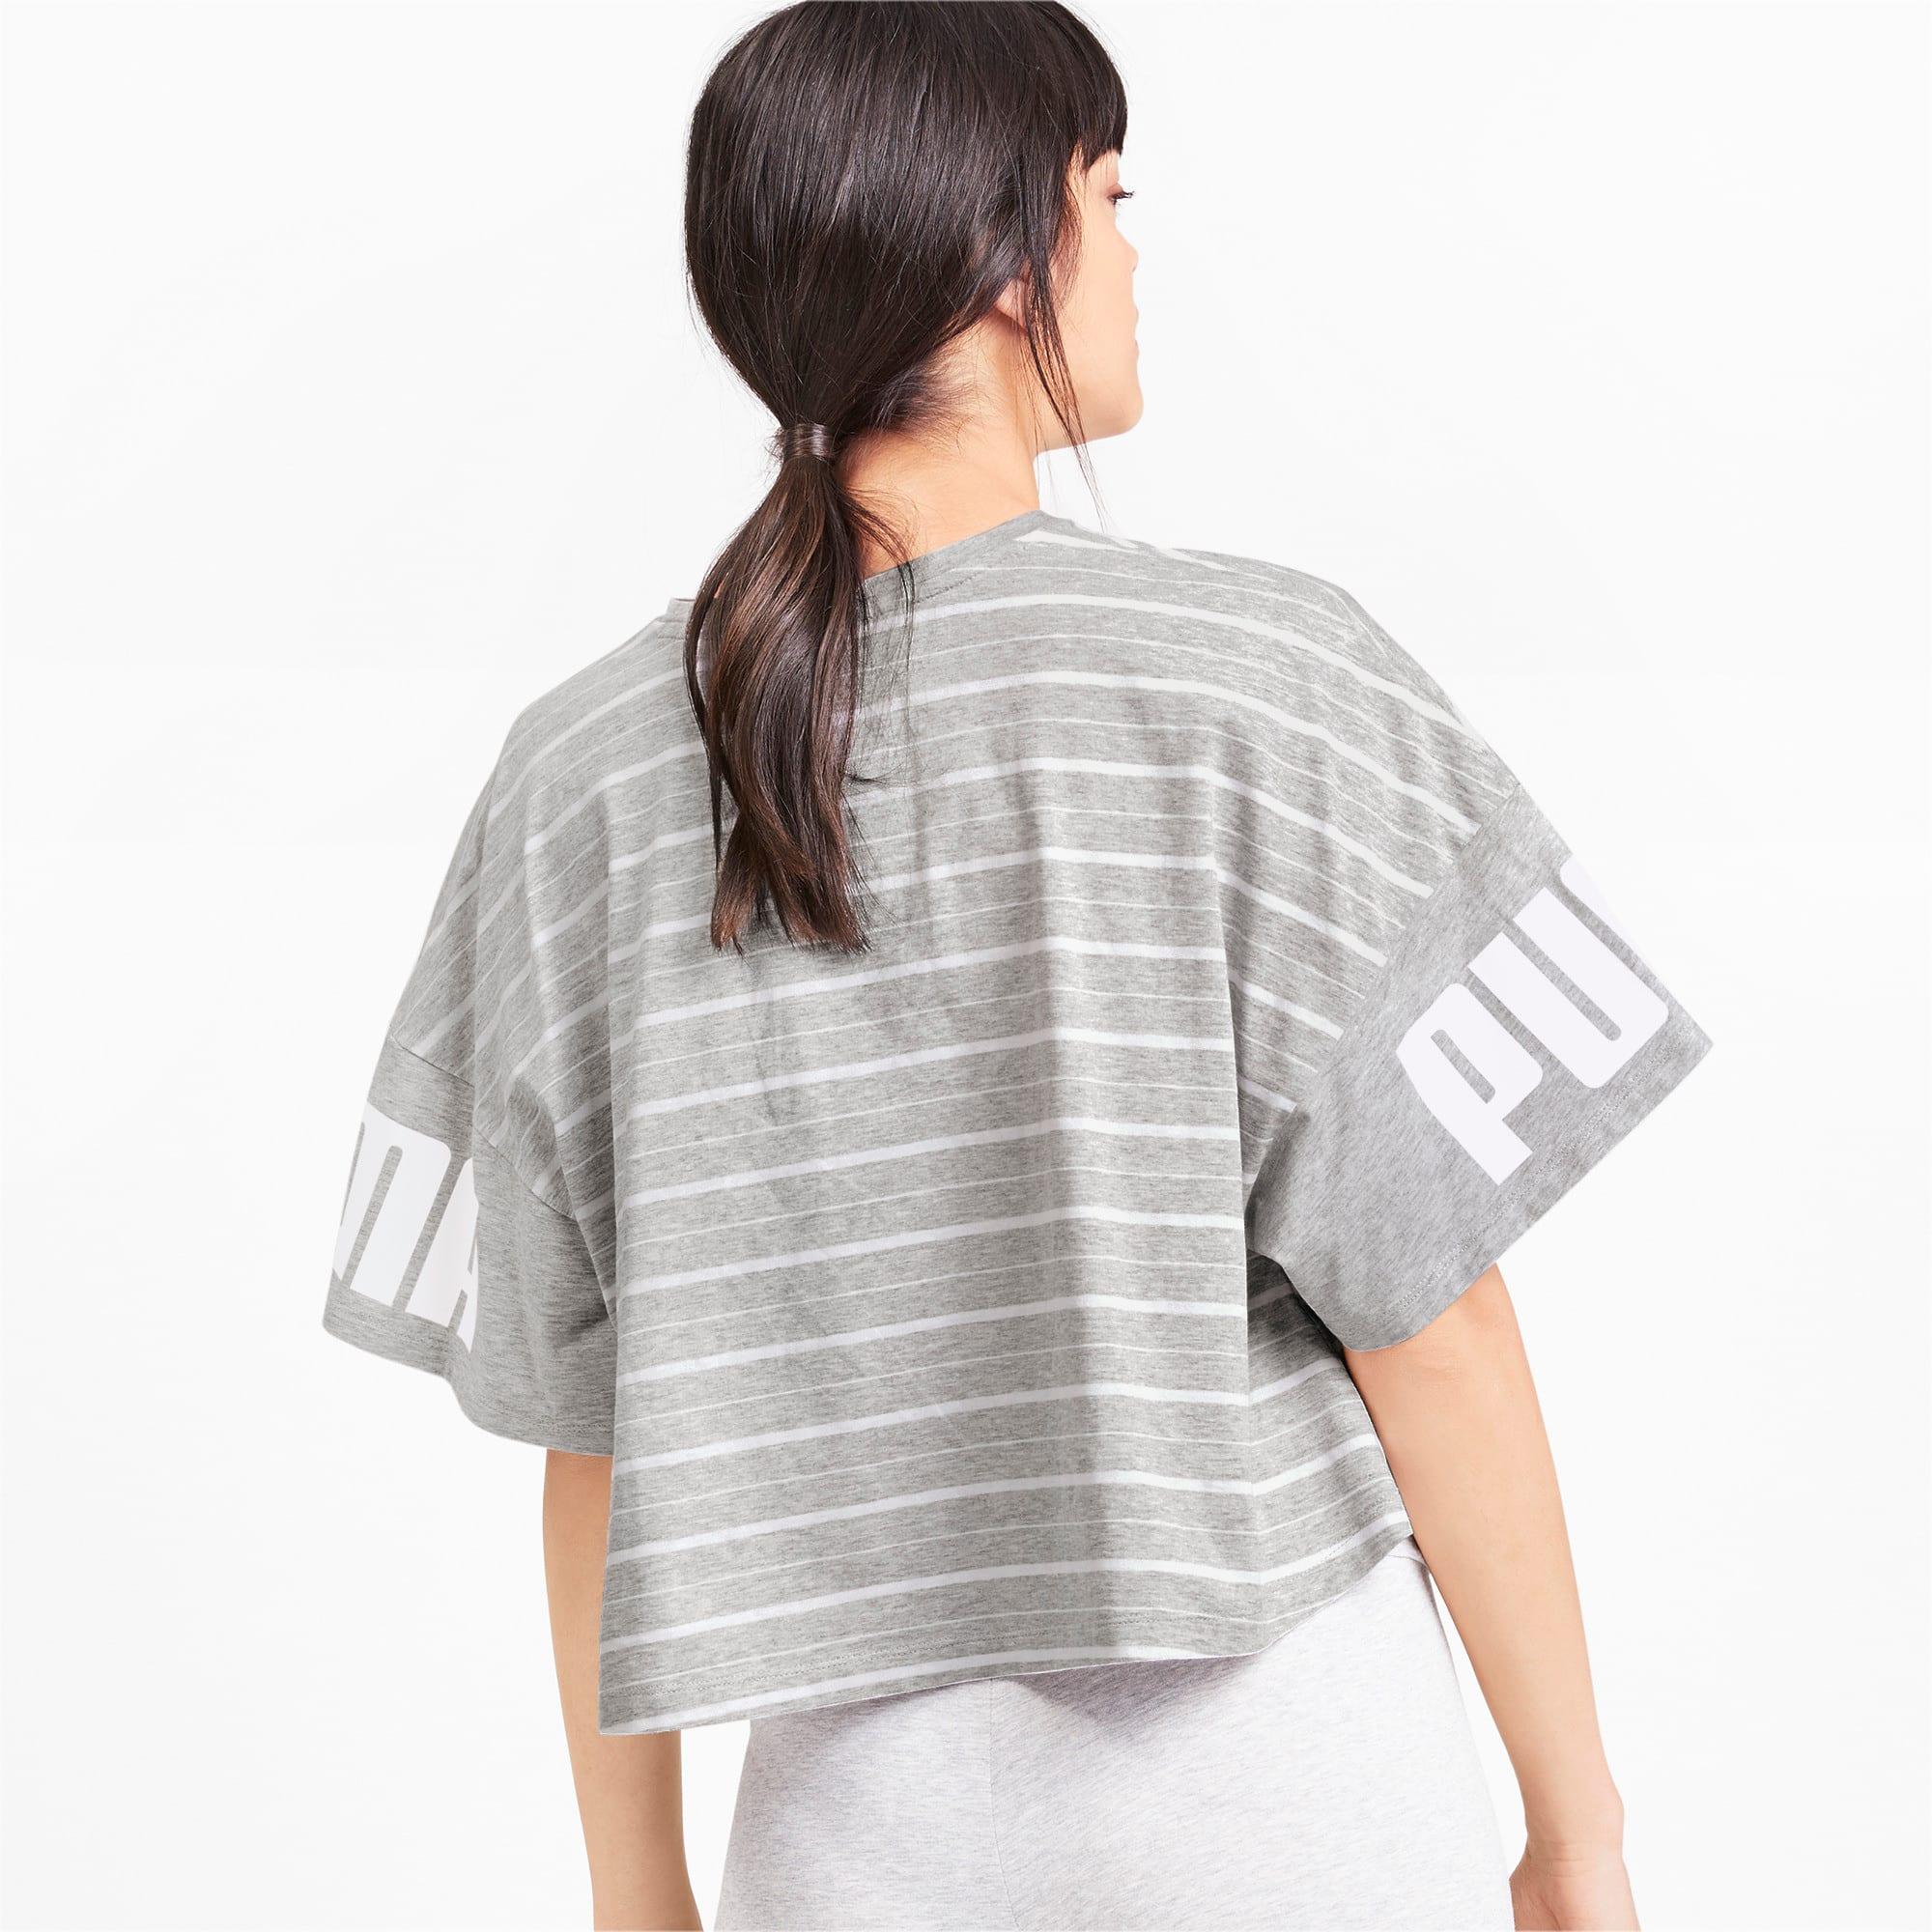 Thumbnail 3 of Rebel Striped Short Sleeve Women's Tee, Light Gray Heather, medium-IND